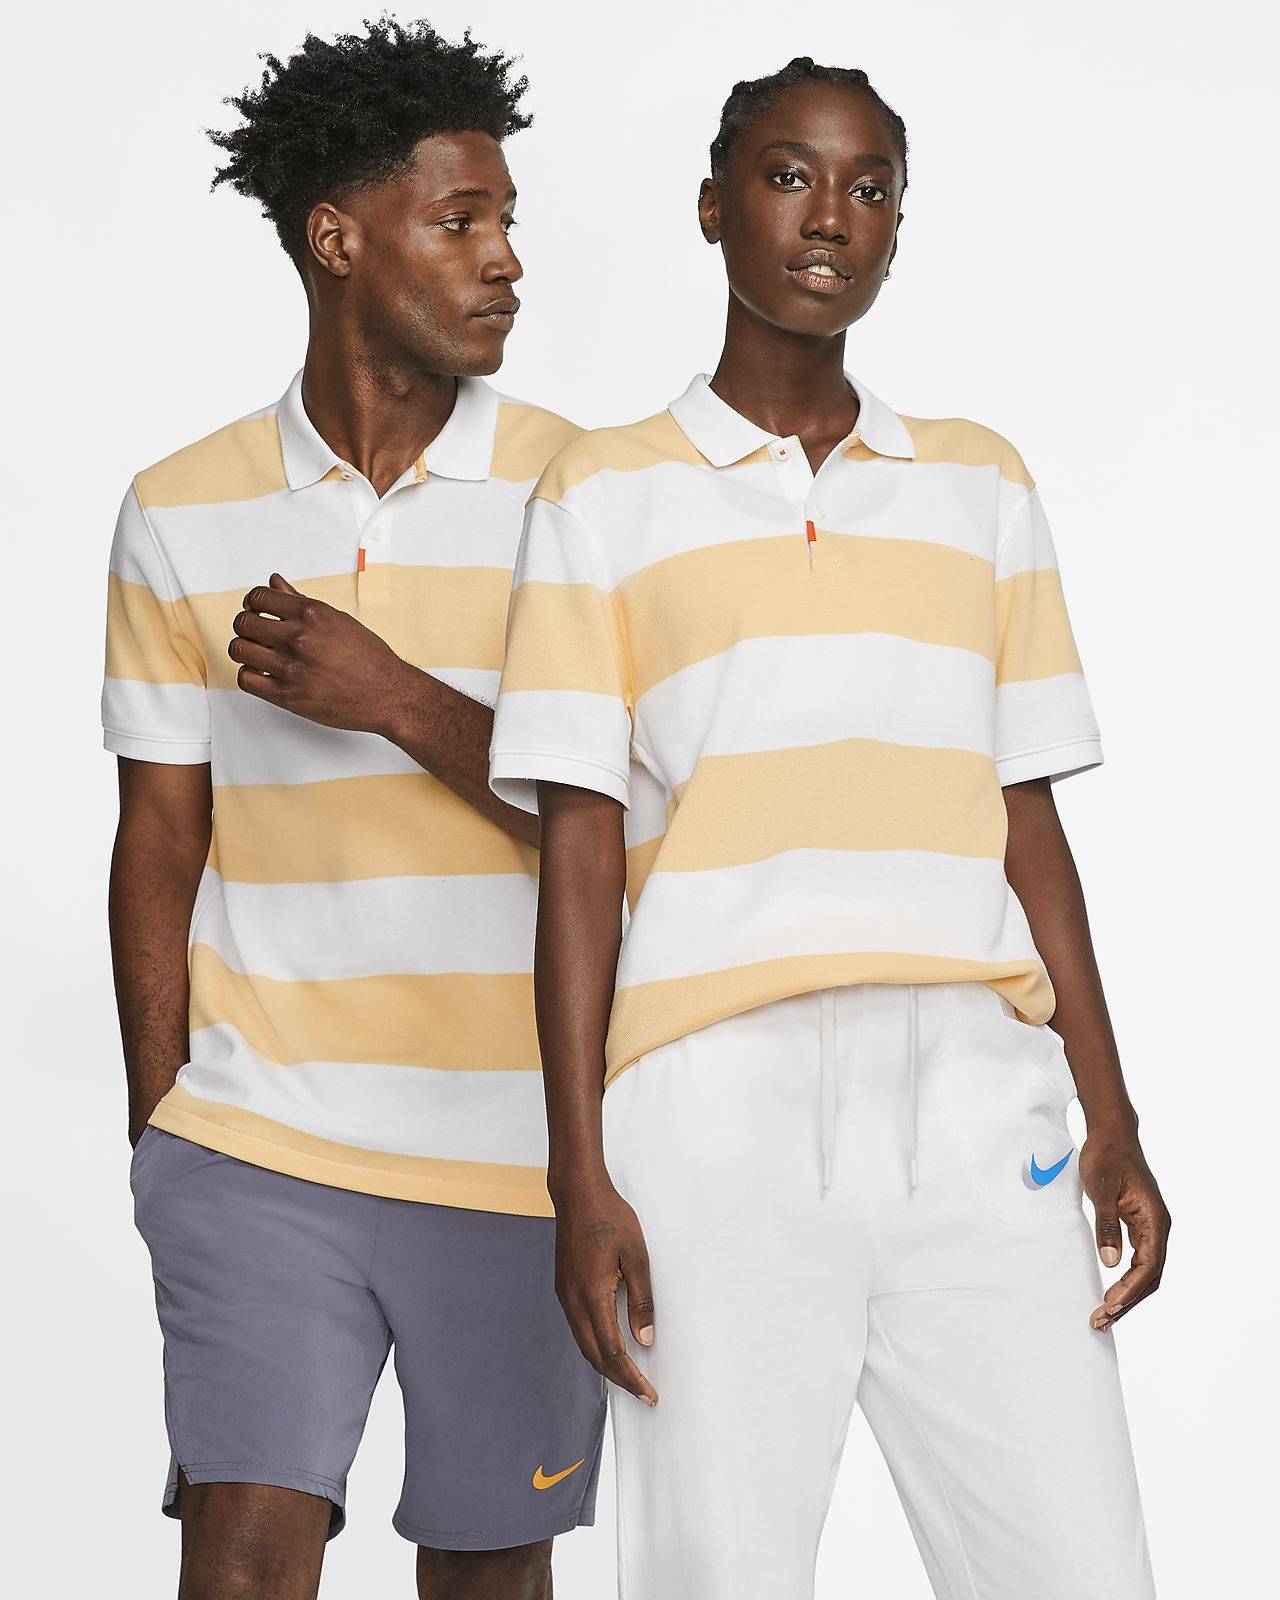 Unisex ριγέ μπλούζα πόλο με στενή εφαρμογή The Nike Polo